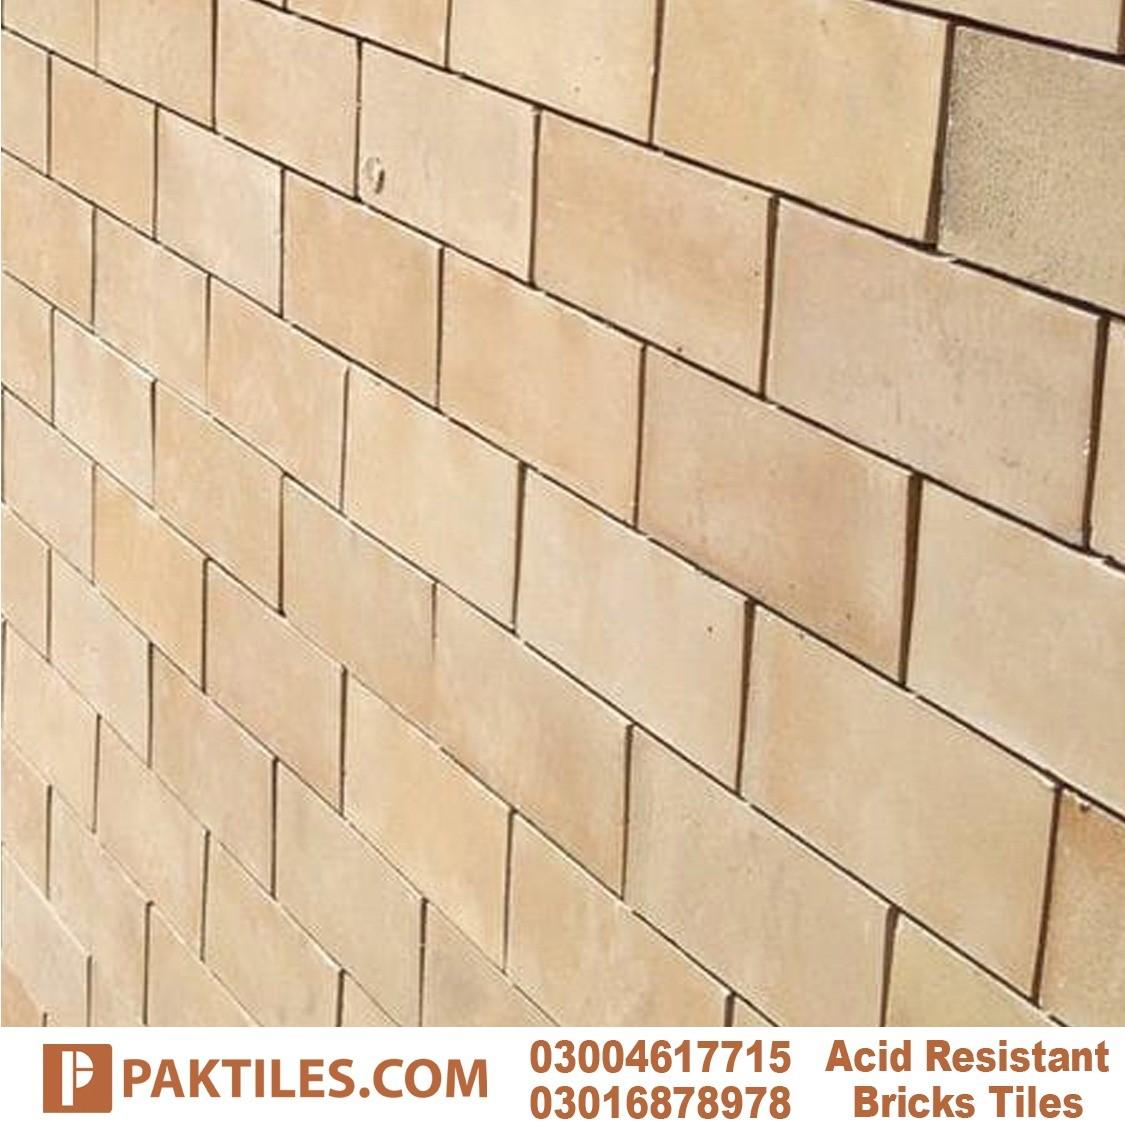 Acid Resistant Tile Supplier in Pakistan